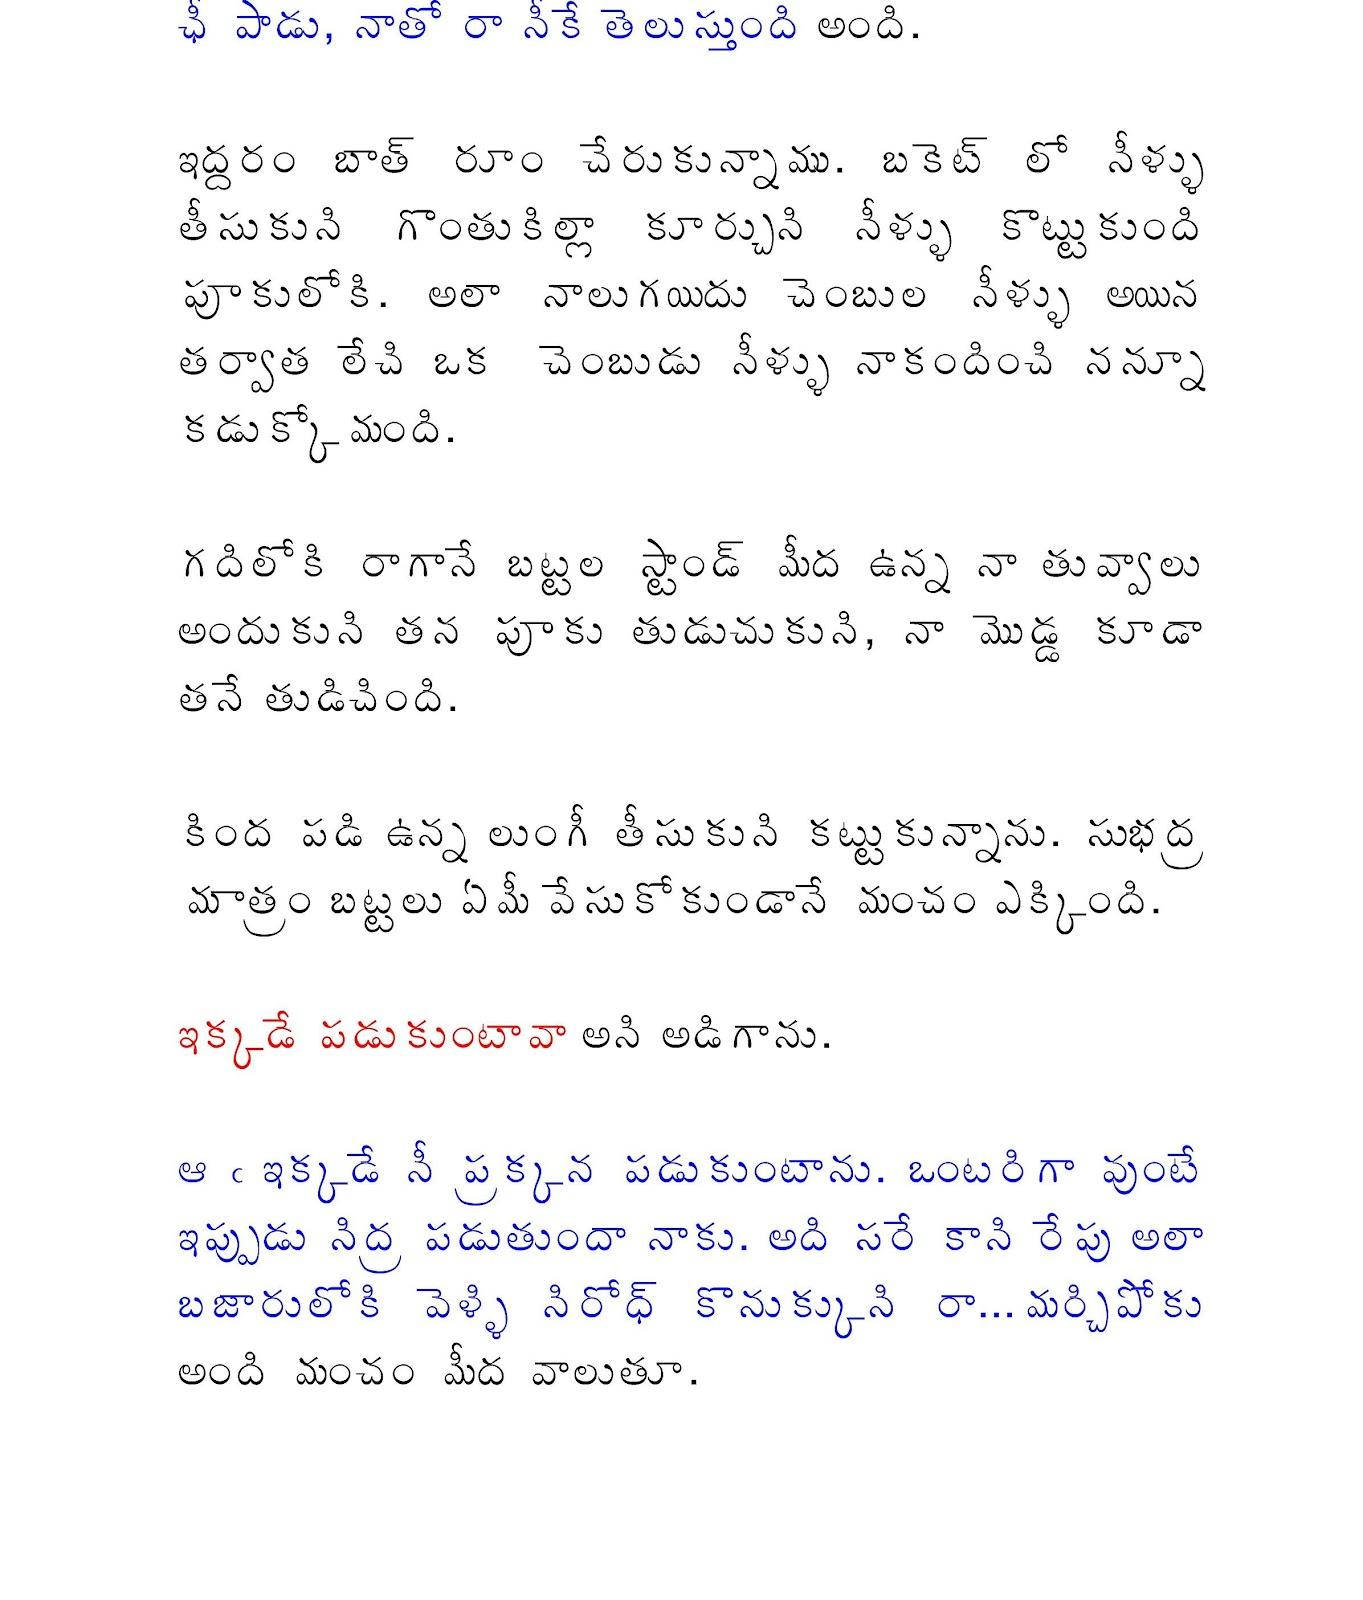 Teluguboothukathalu meekosam blogspot com